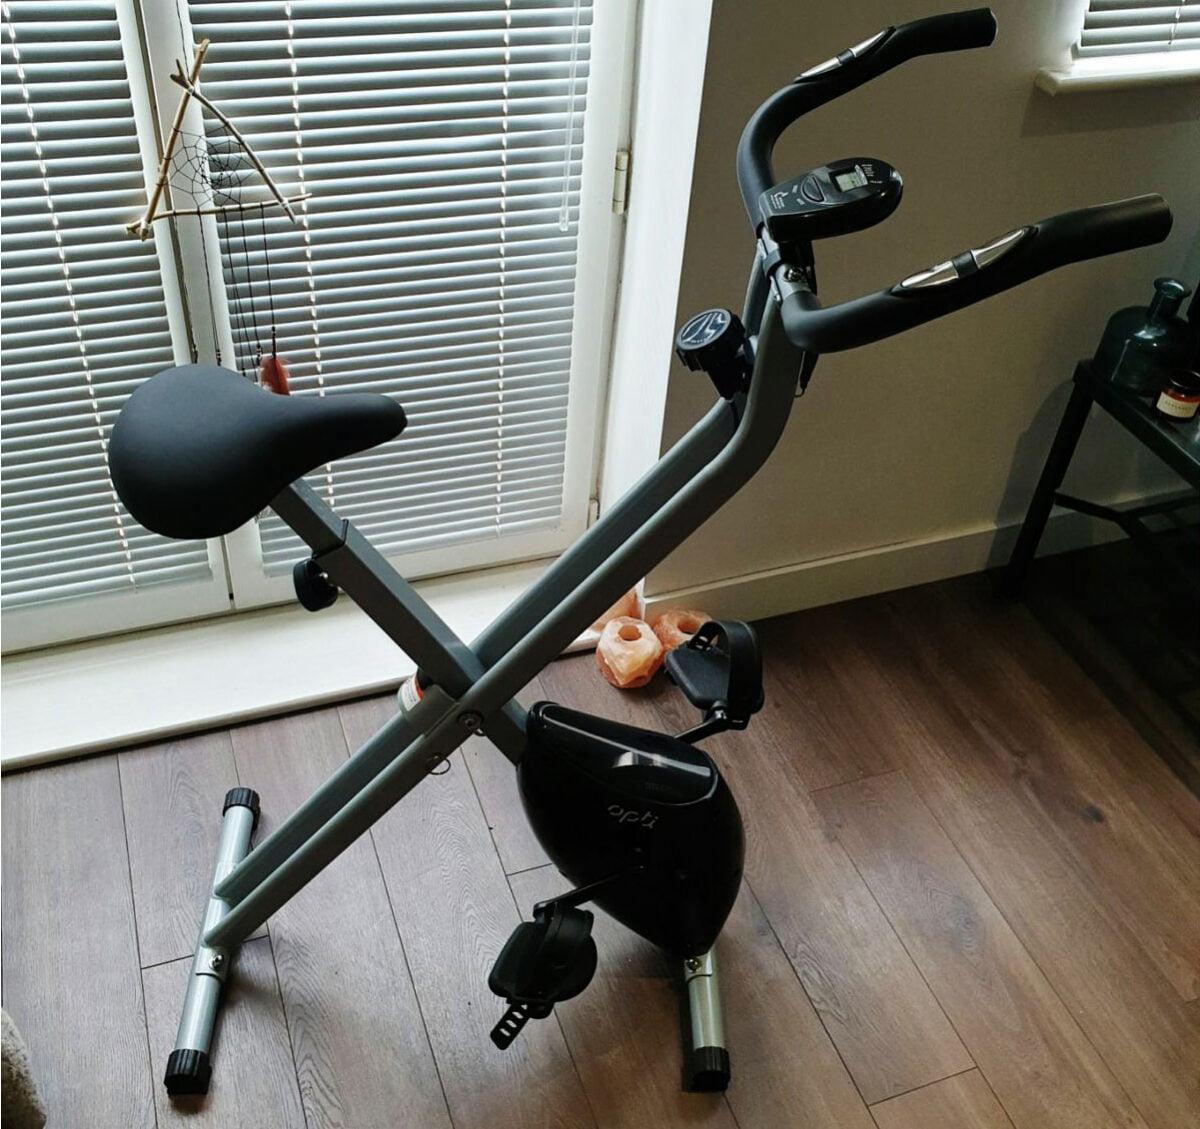 Opti Folding Magnetic Exercise Bike comparison